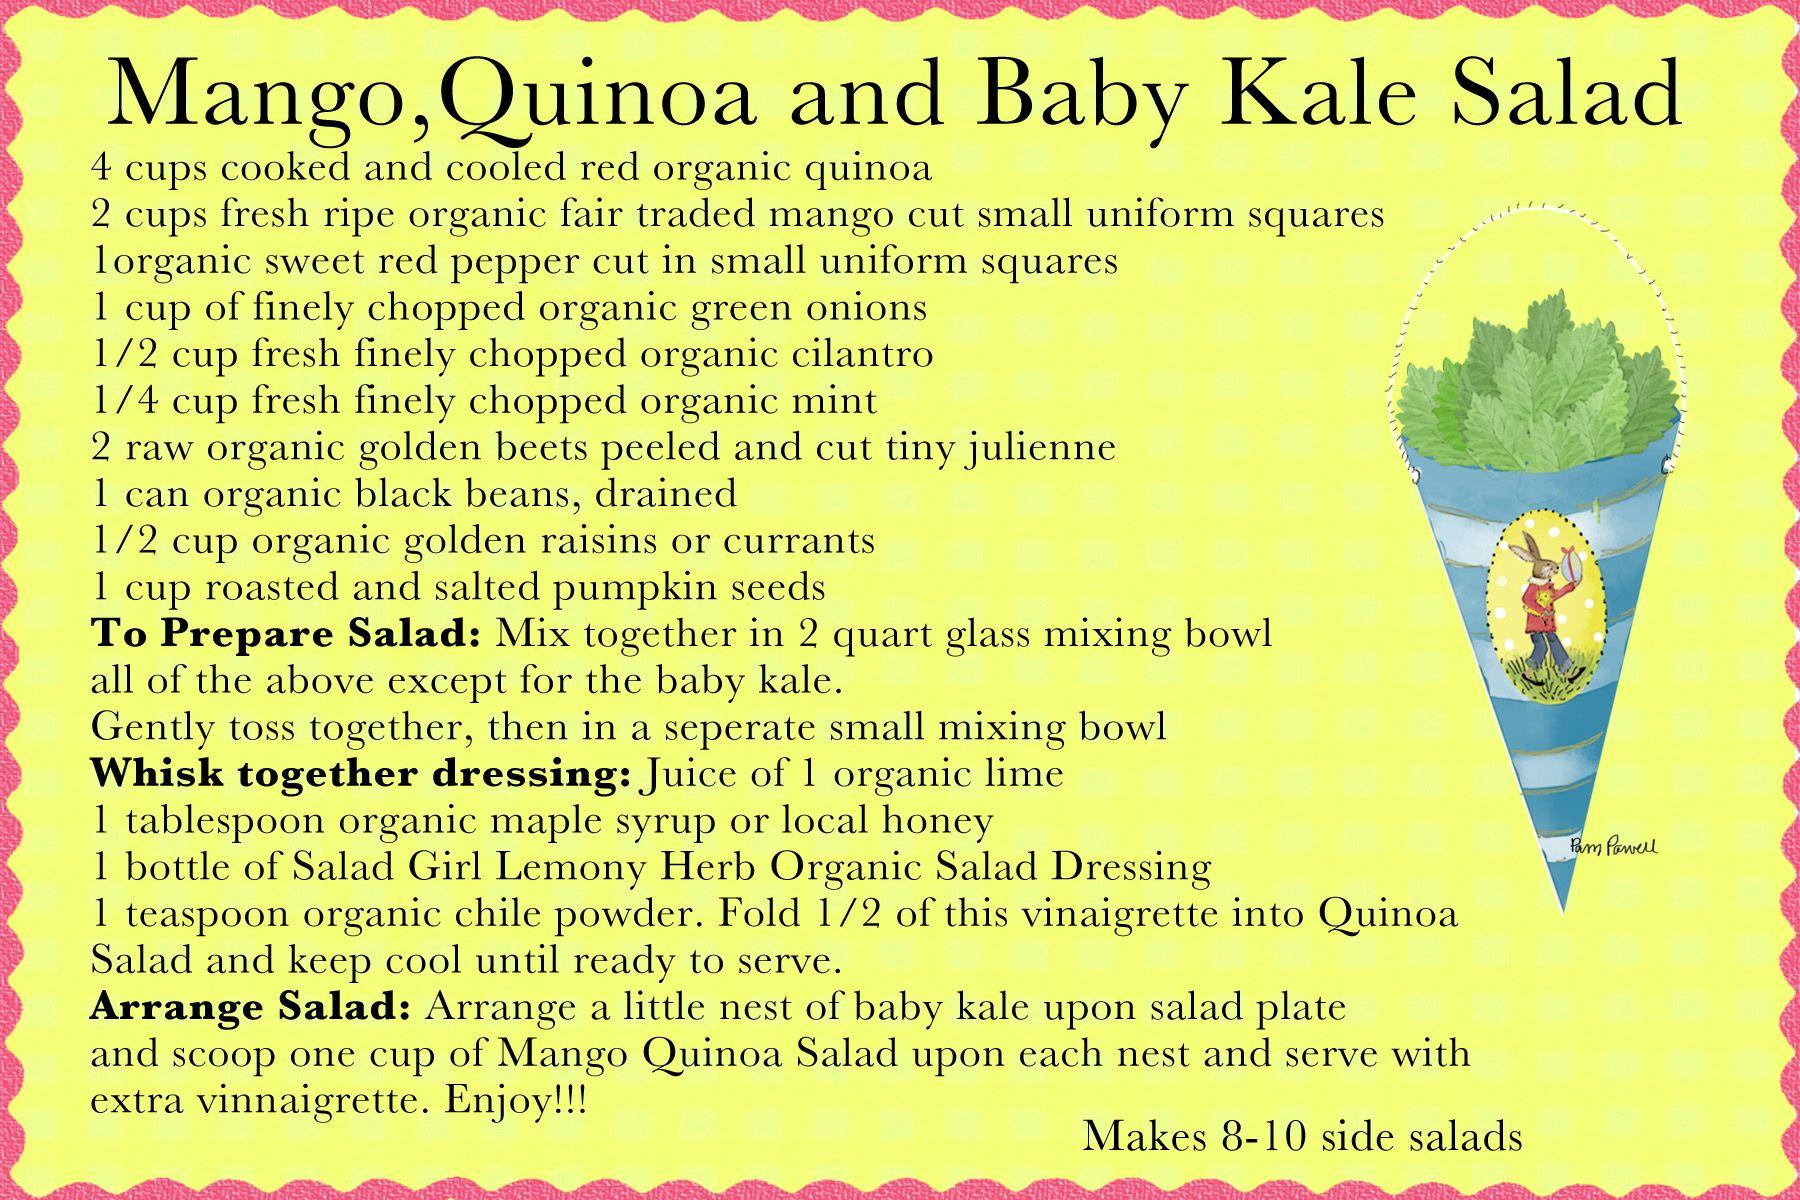 Mango Quinoa and Baby Kale Salad